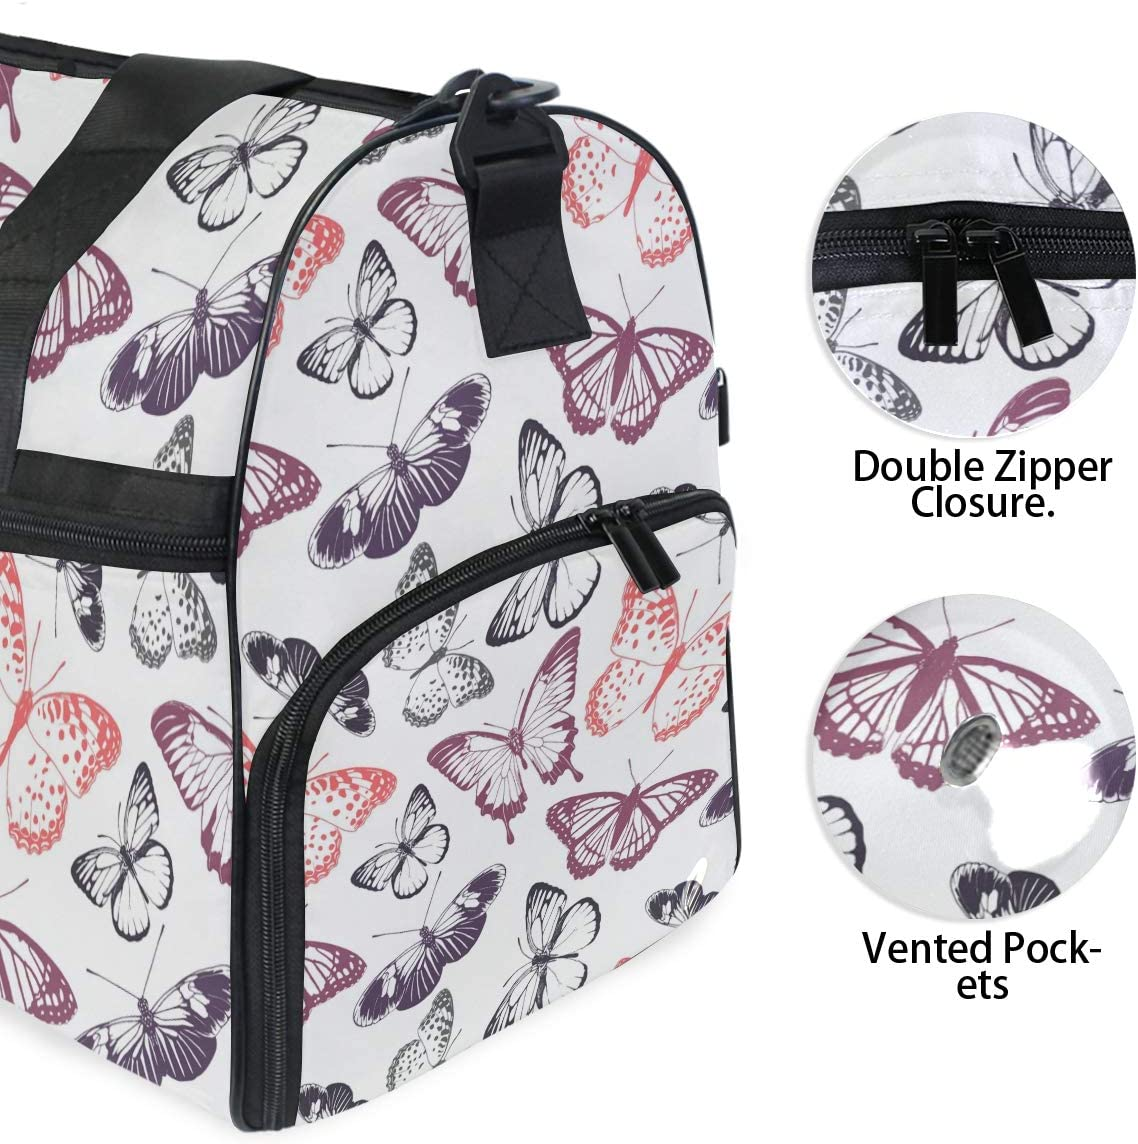 FANTAZIO Butterflies Seamless Pattern Sports Duffle Bag Gym Bag Travel Duffel with Adjustable Strap